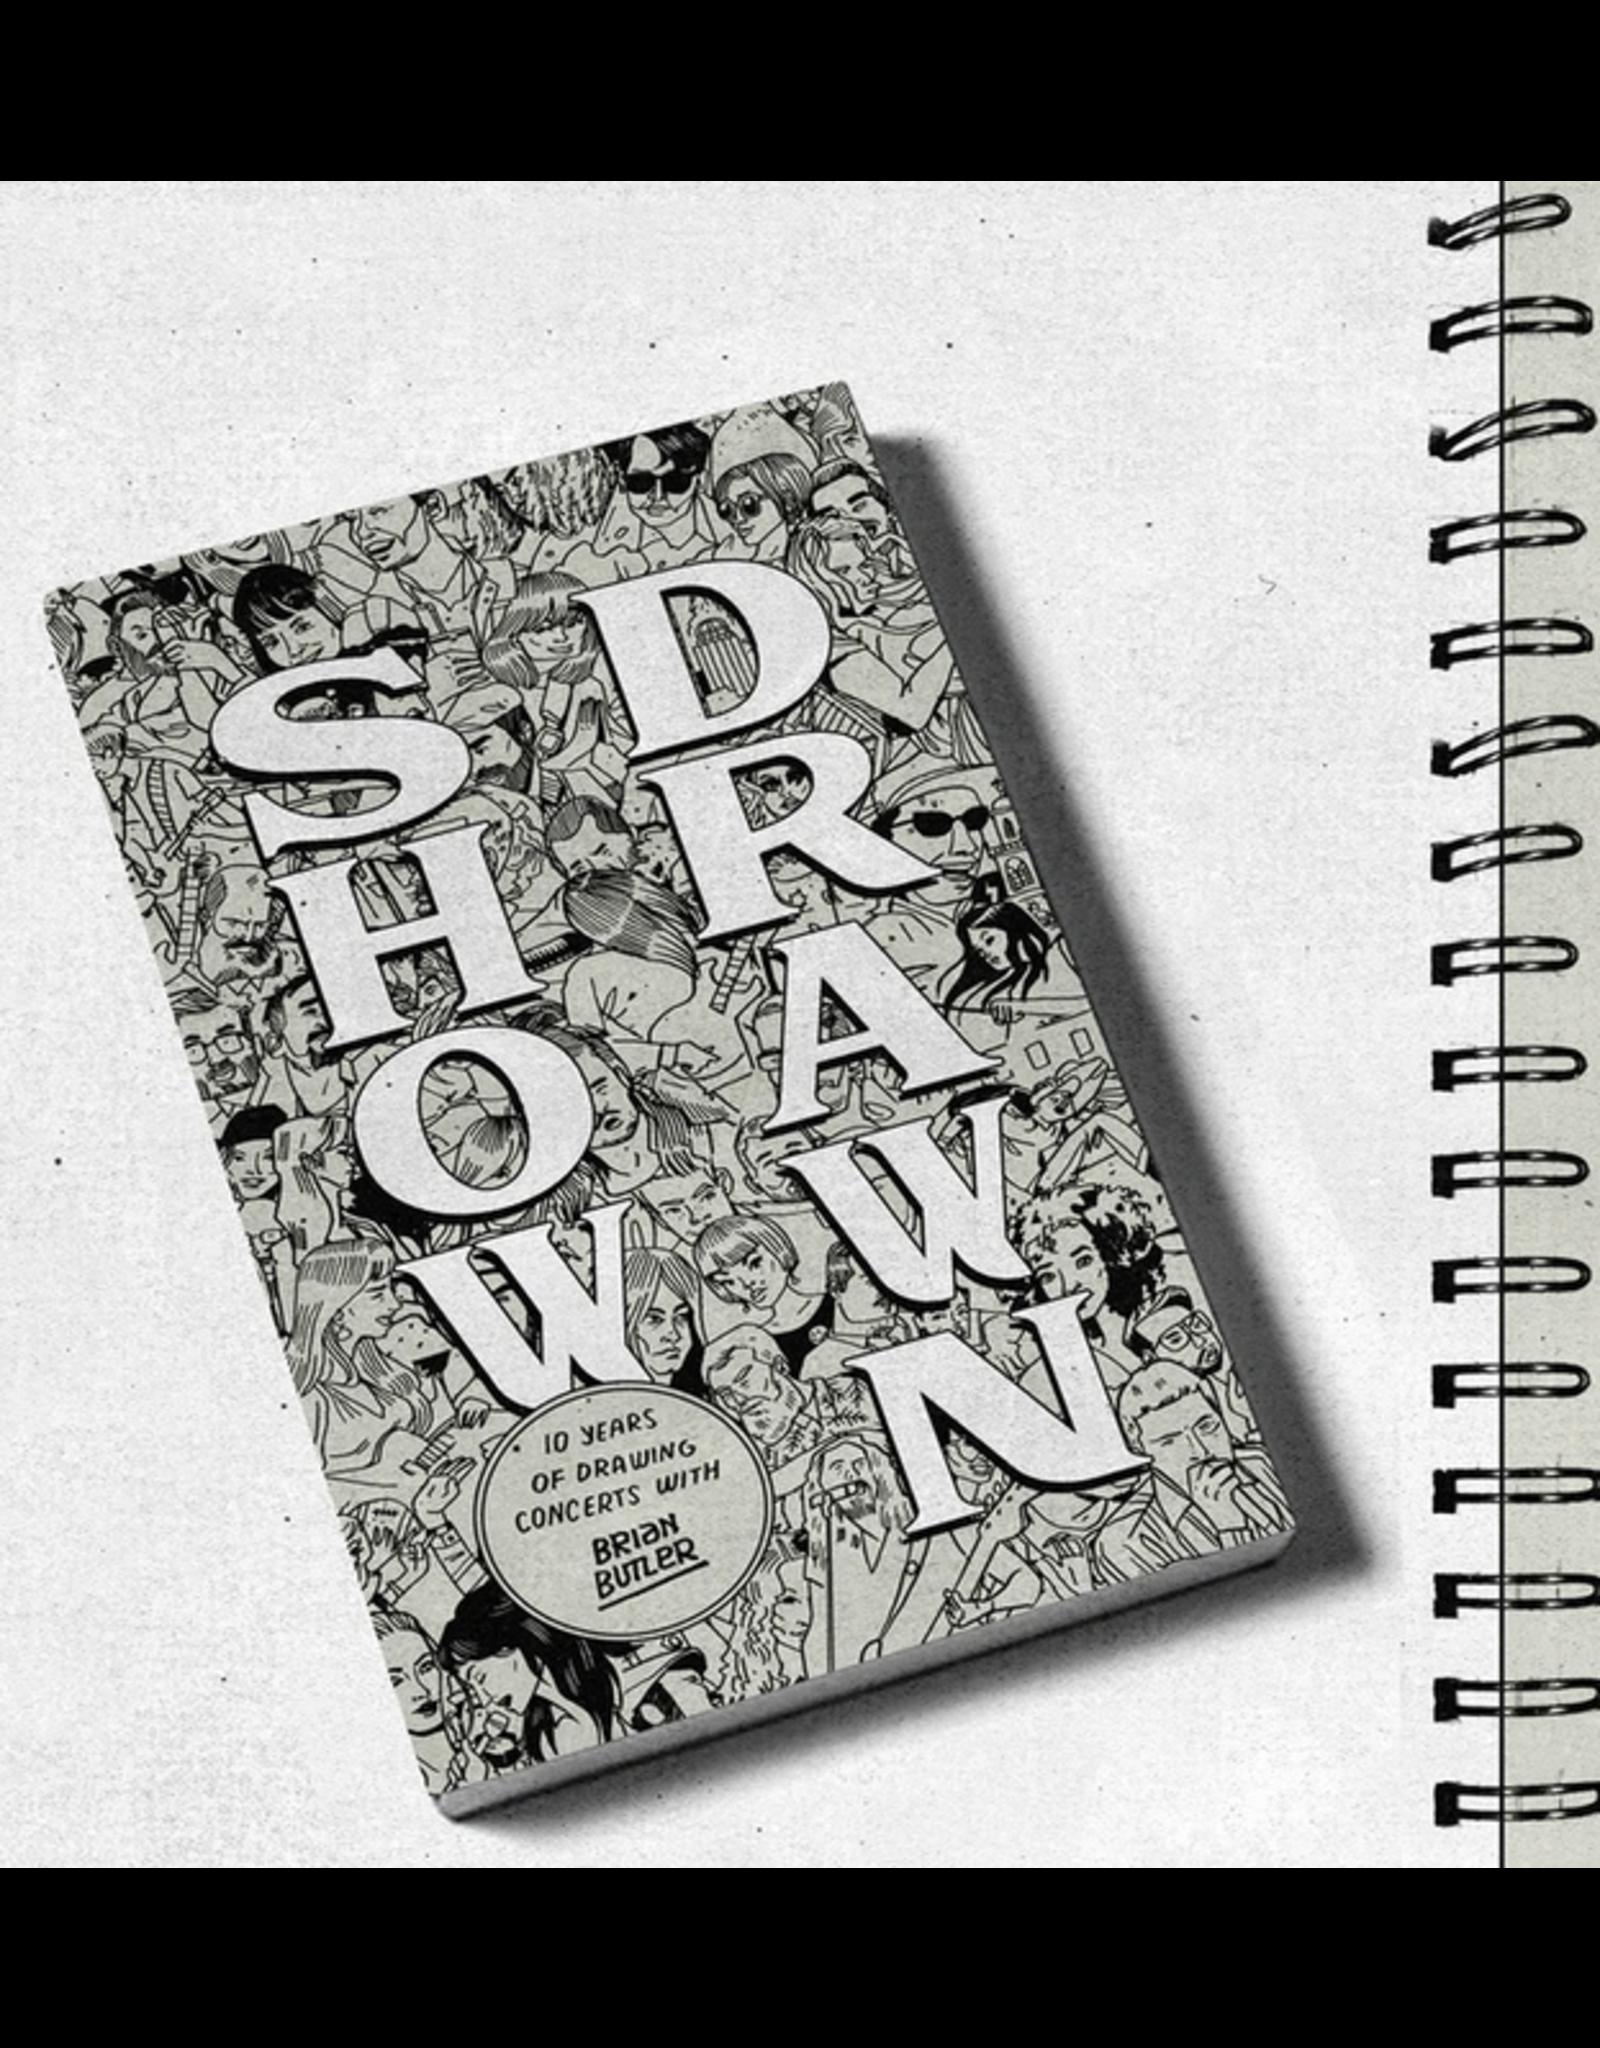 Book Brian Butler: Show Drawn